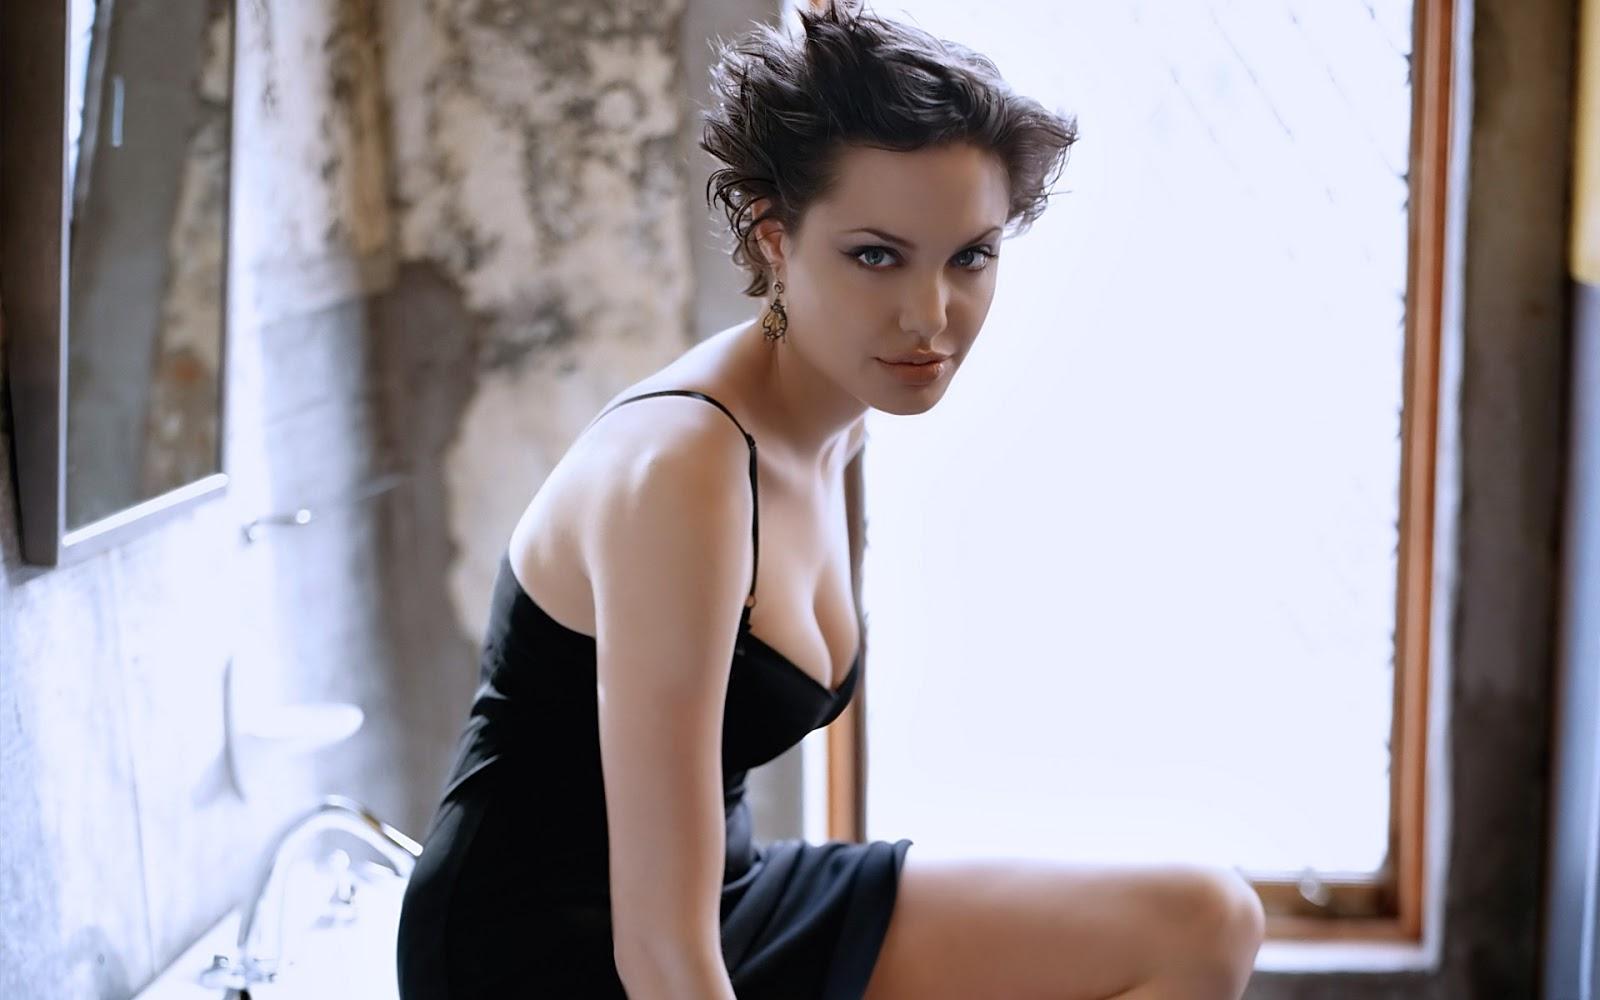 Nude Photos Of Jolie